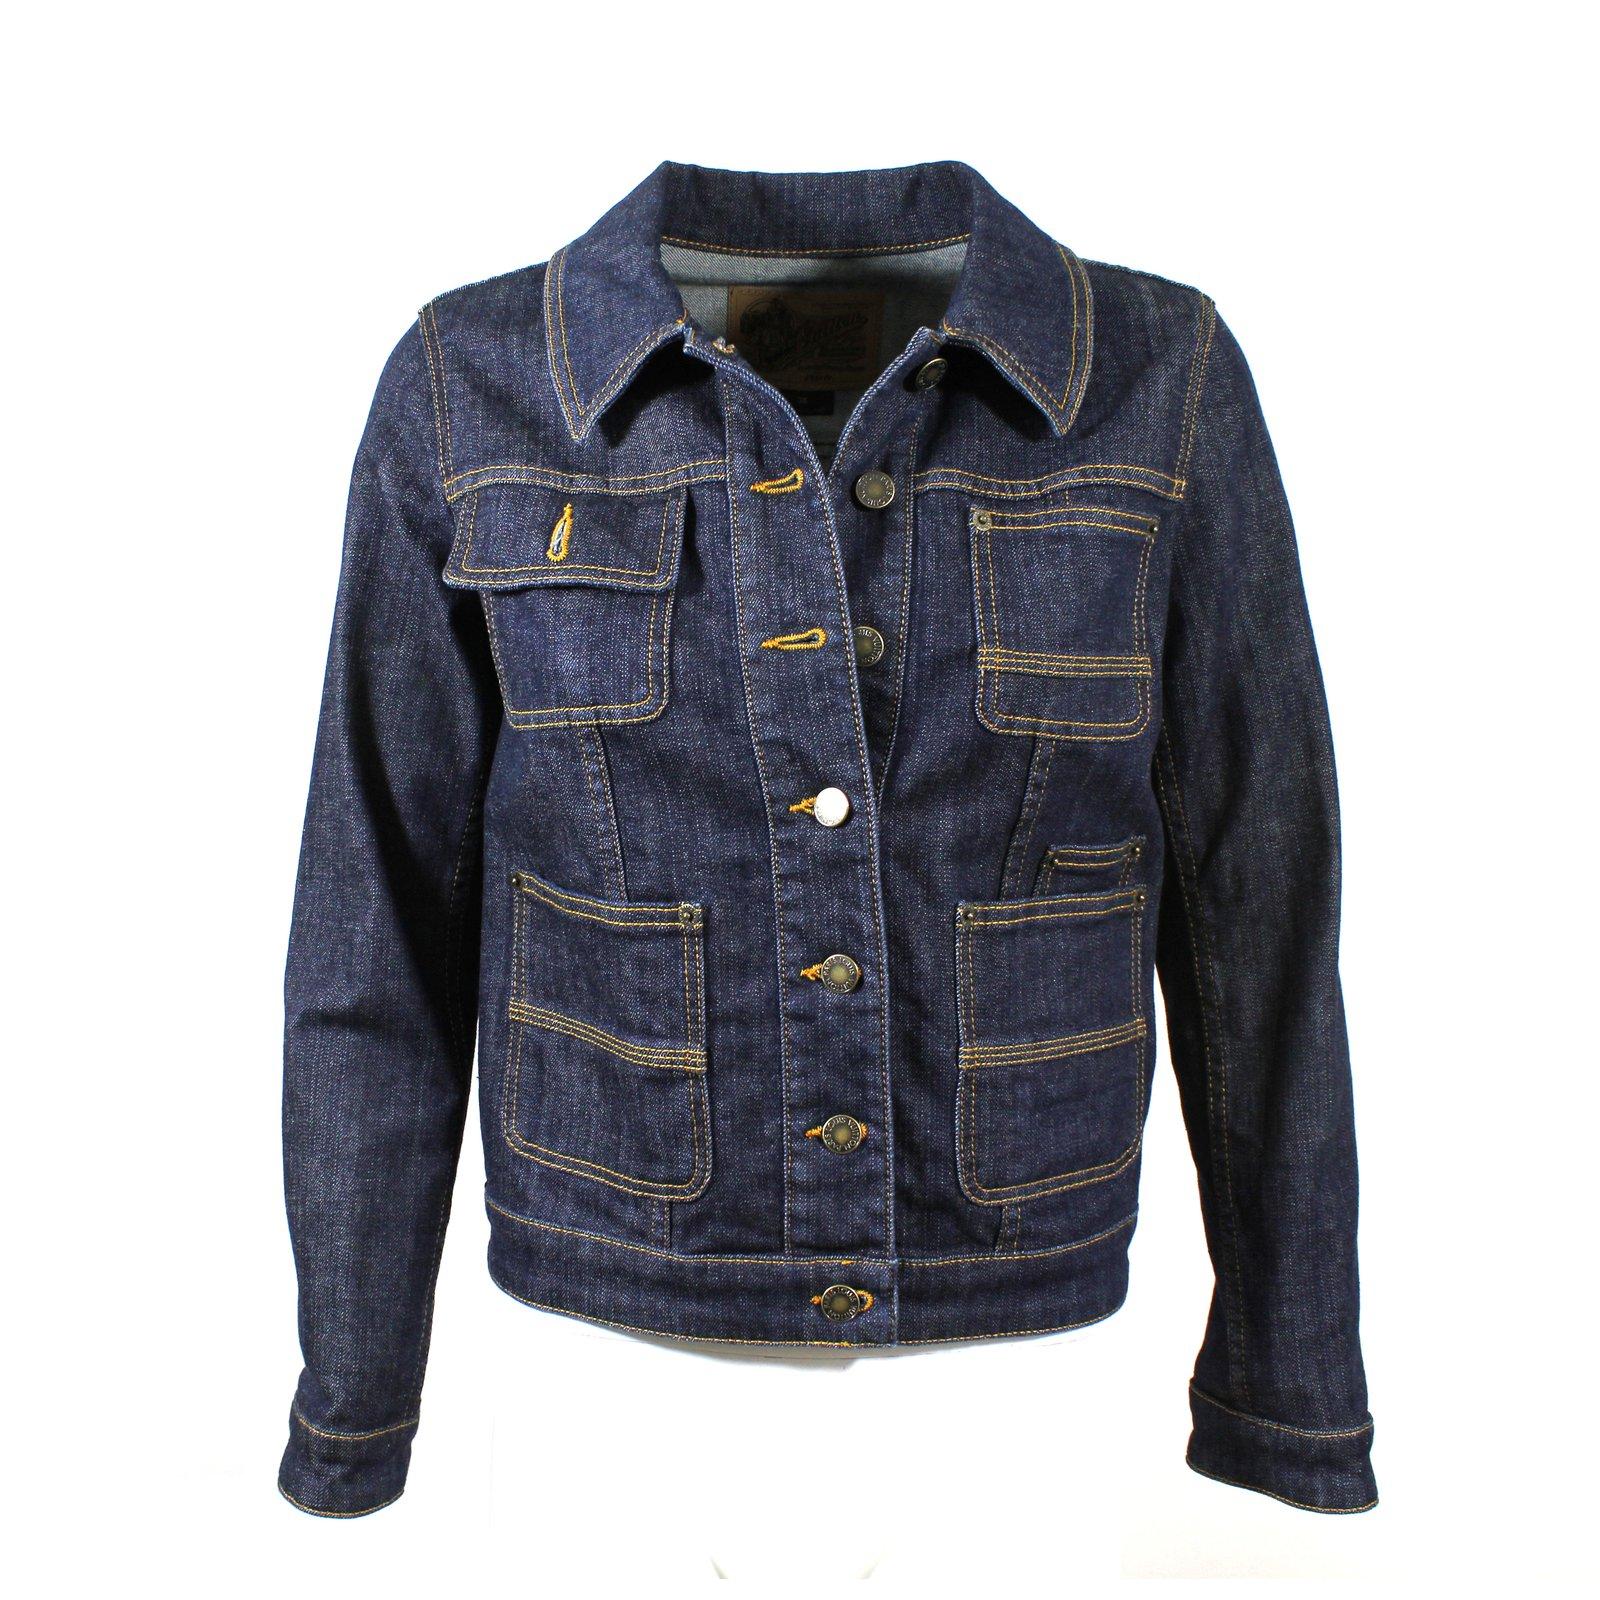 vestes louis vuitton belle veste jean jean bleu joli closet. Black Bedroom Furniture Sets. Home Design Ideas